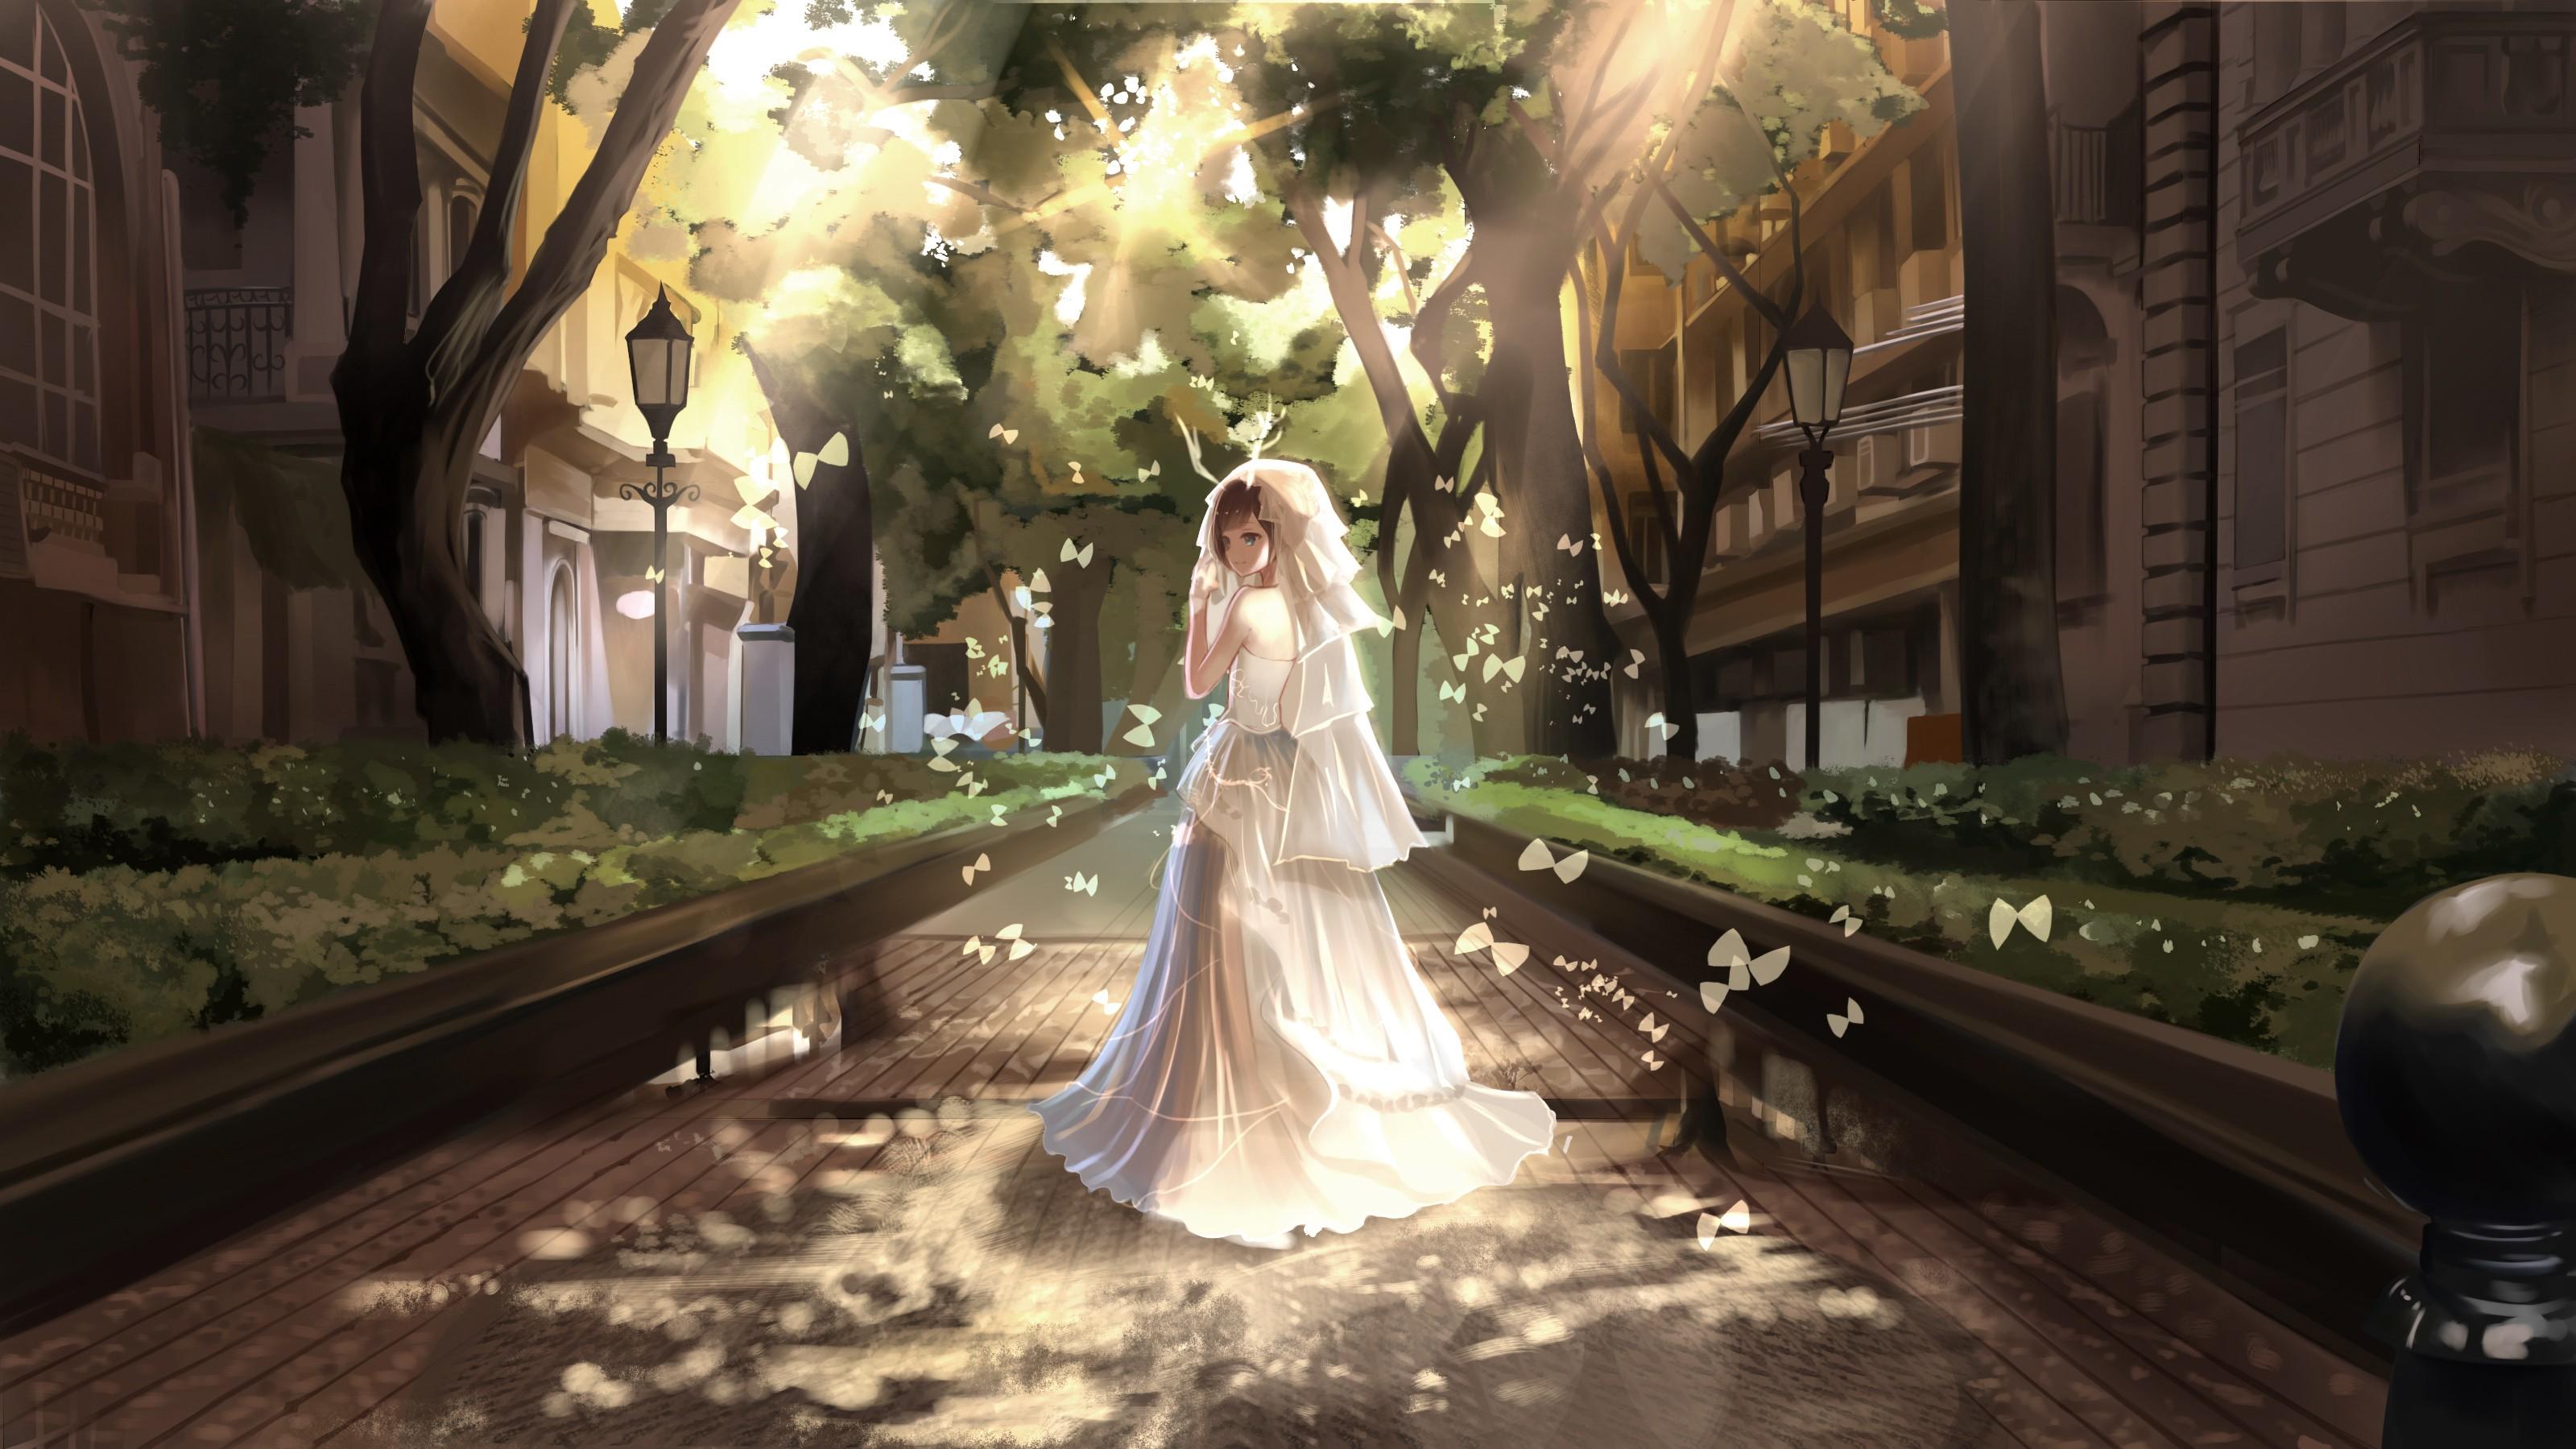 Anime 3199x1799 original characters short hair brunette blue eyes wedding dress white gloves butterfly street trees looking back smiling anime girls anime